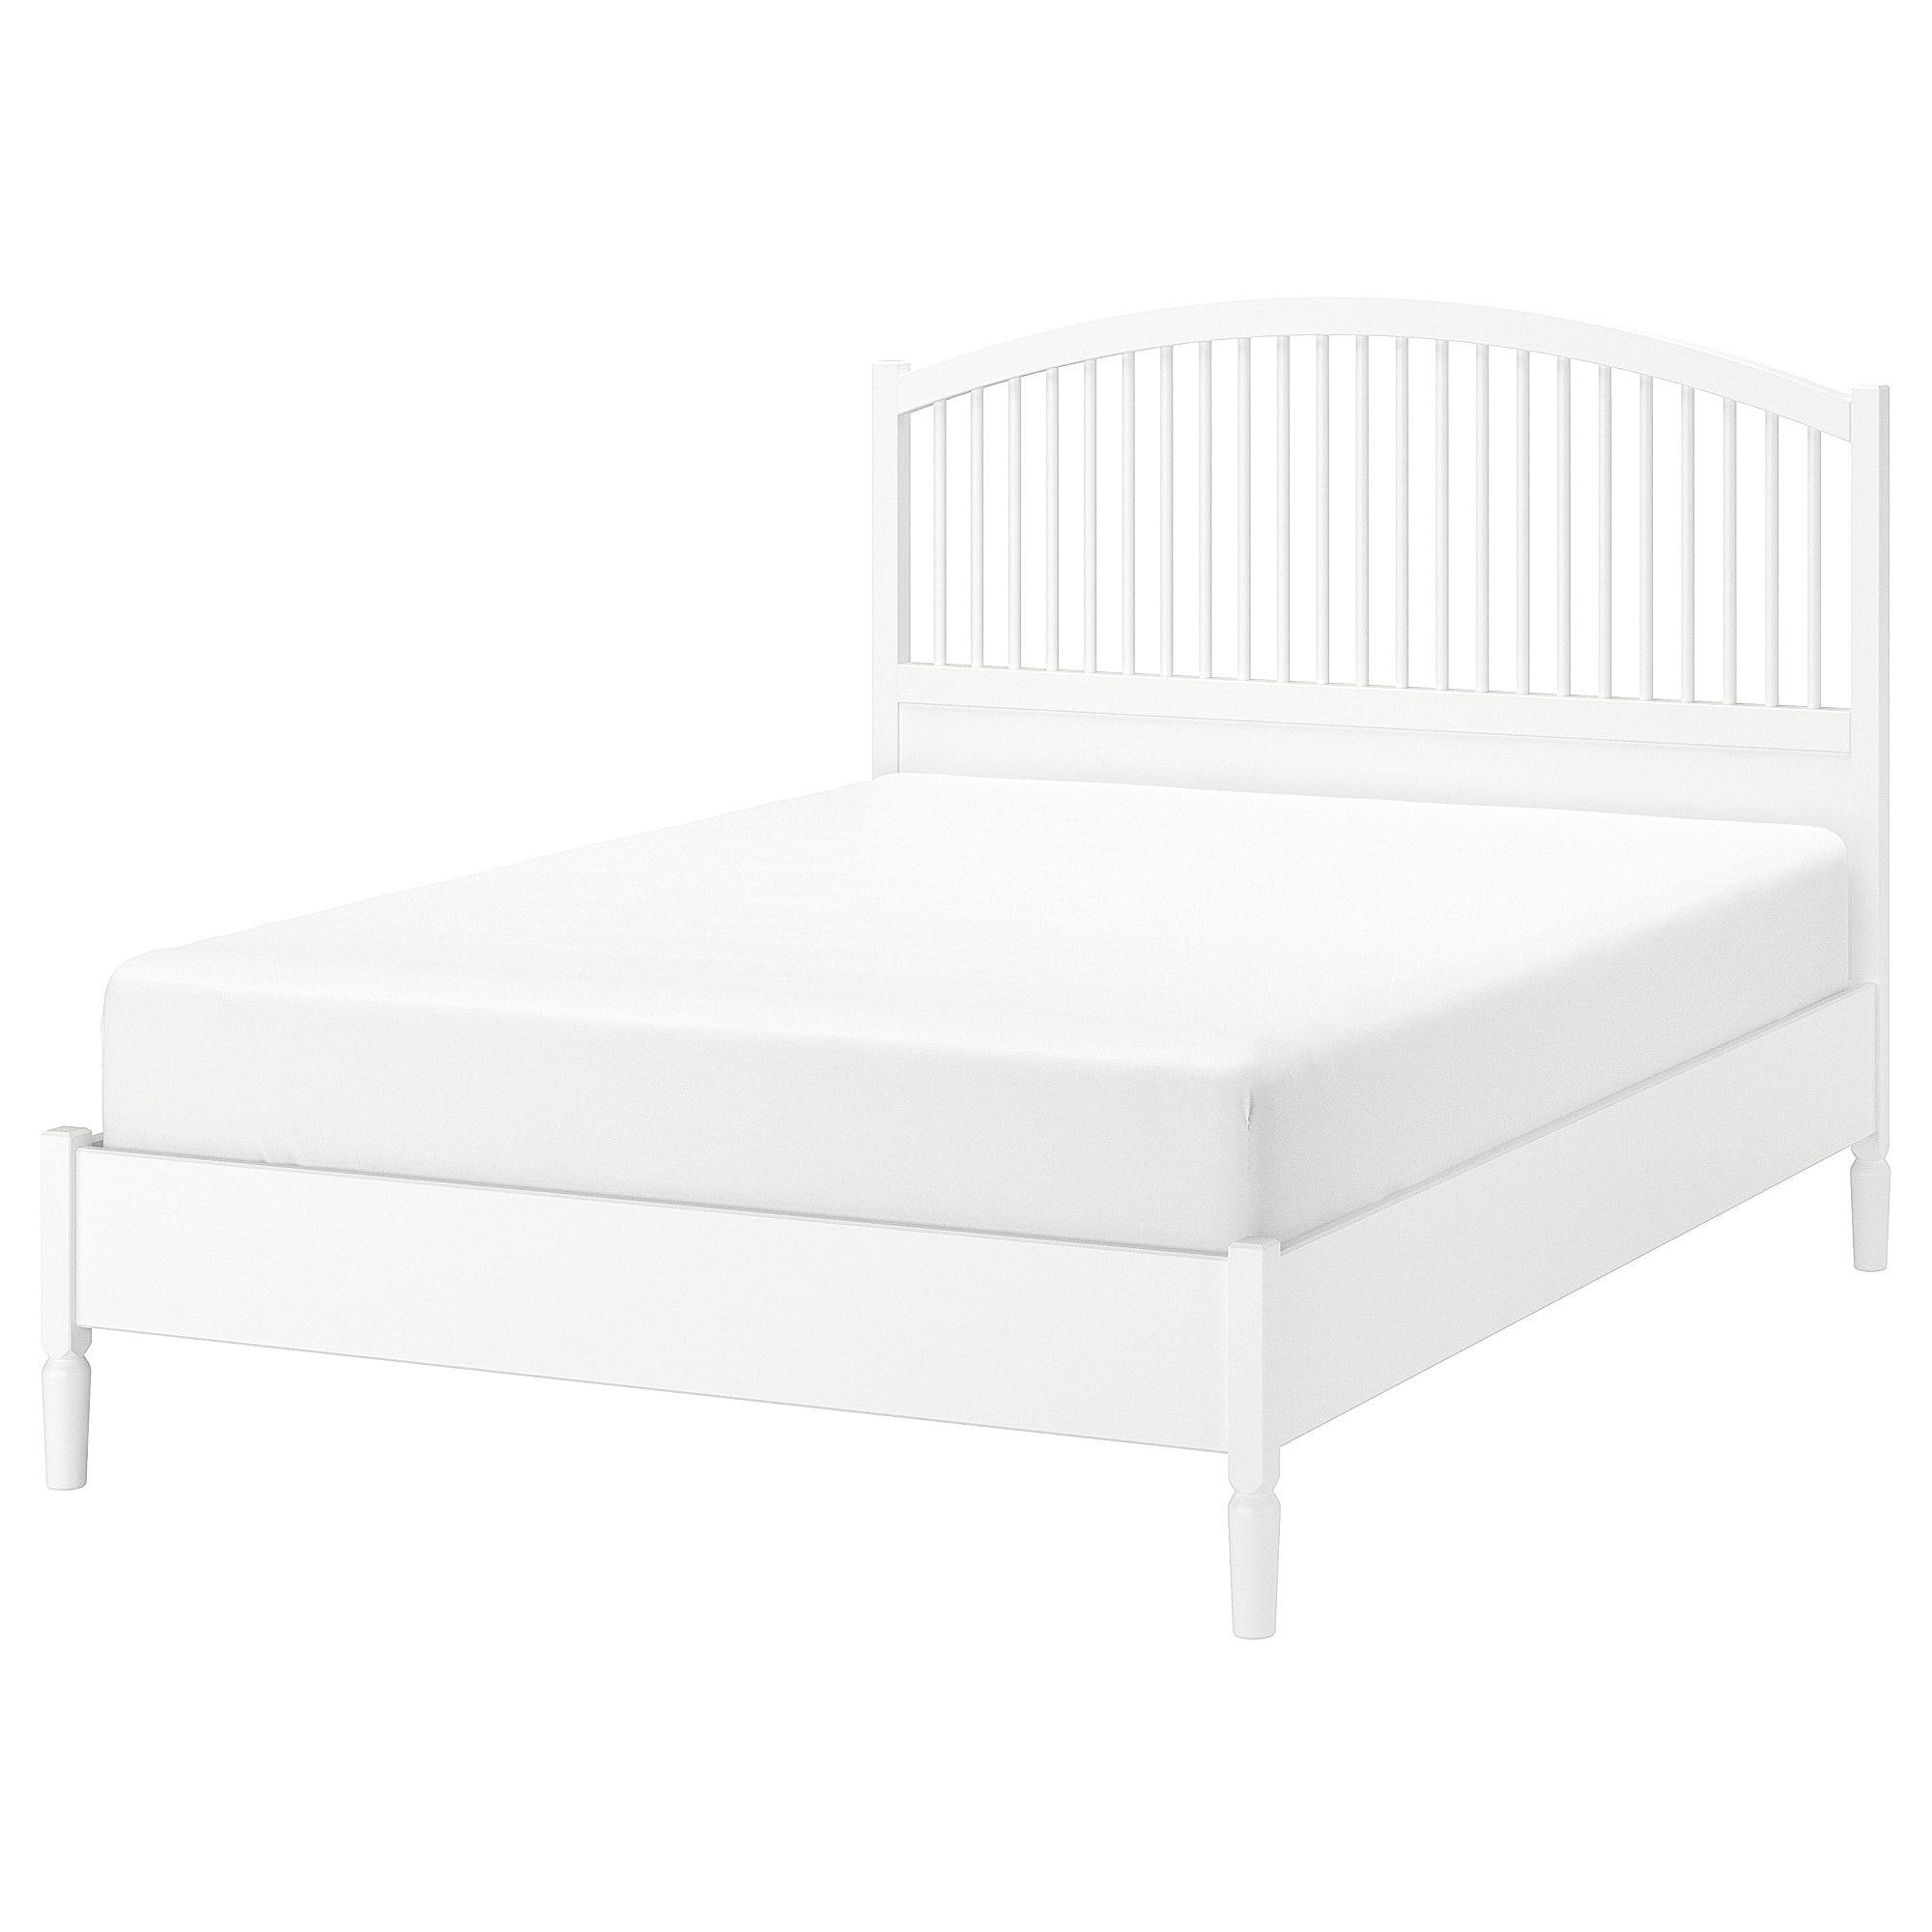 Tyssedal Bedframe Wit 160x200 Cm Ikea In 2020 Bed Frame Ikea Tyssedal King Size Bed Frame